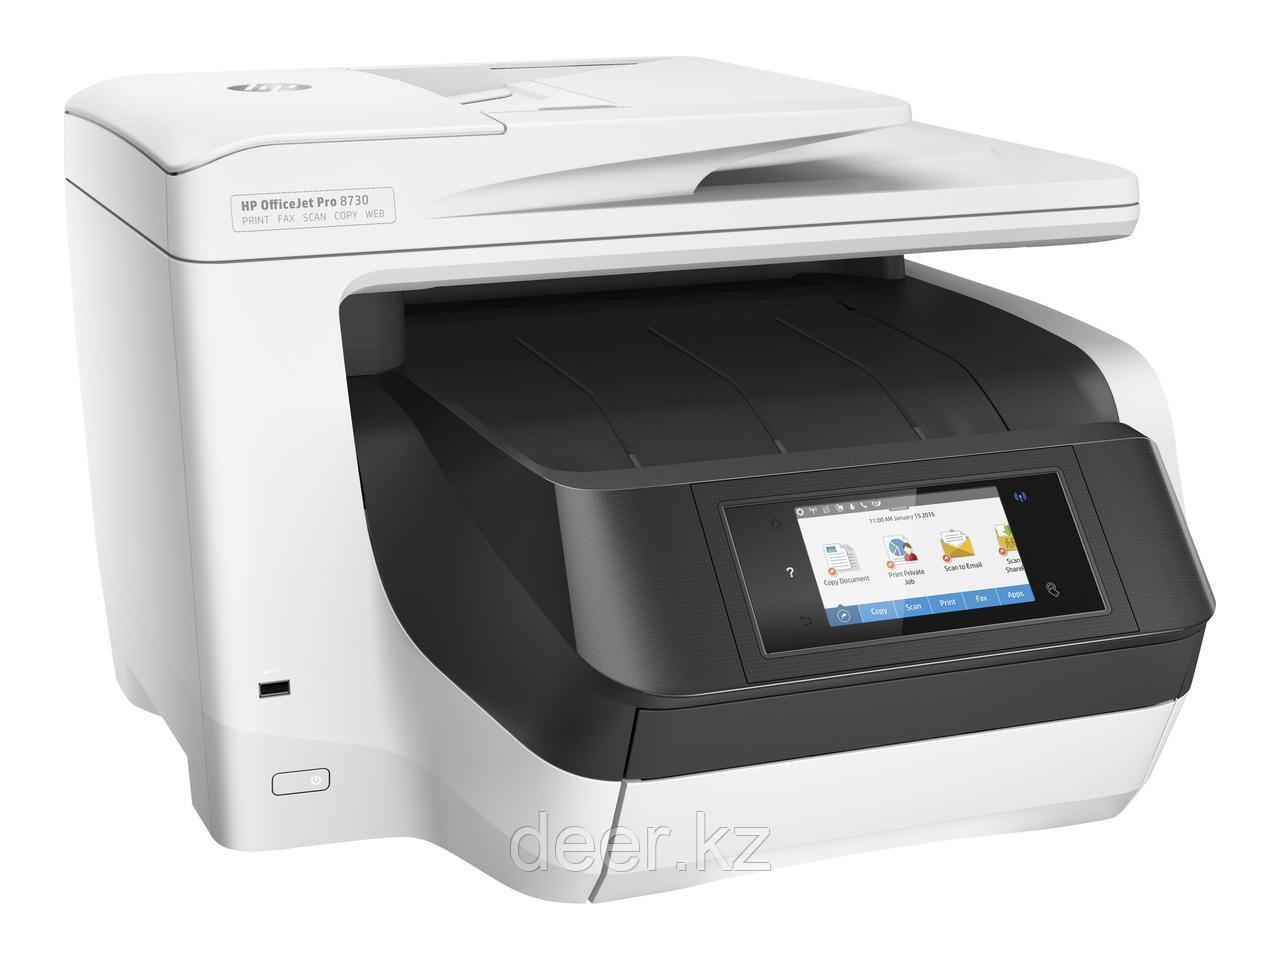 МФП HP Europe OfficeJet Pro 8730 D9L20A#A80